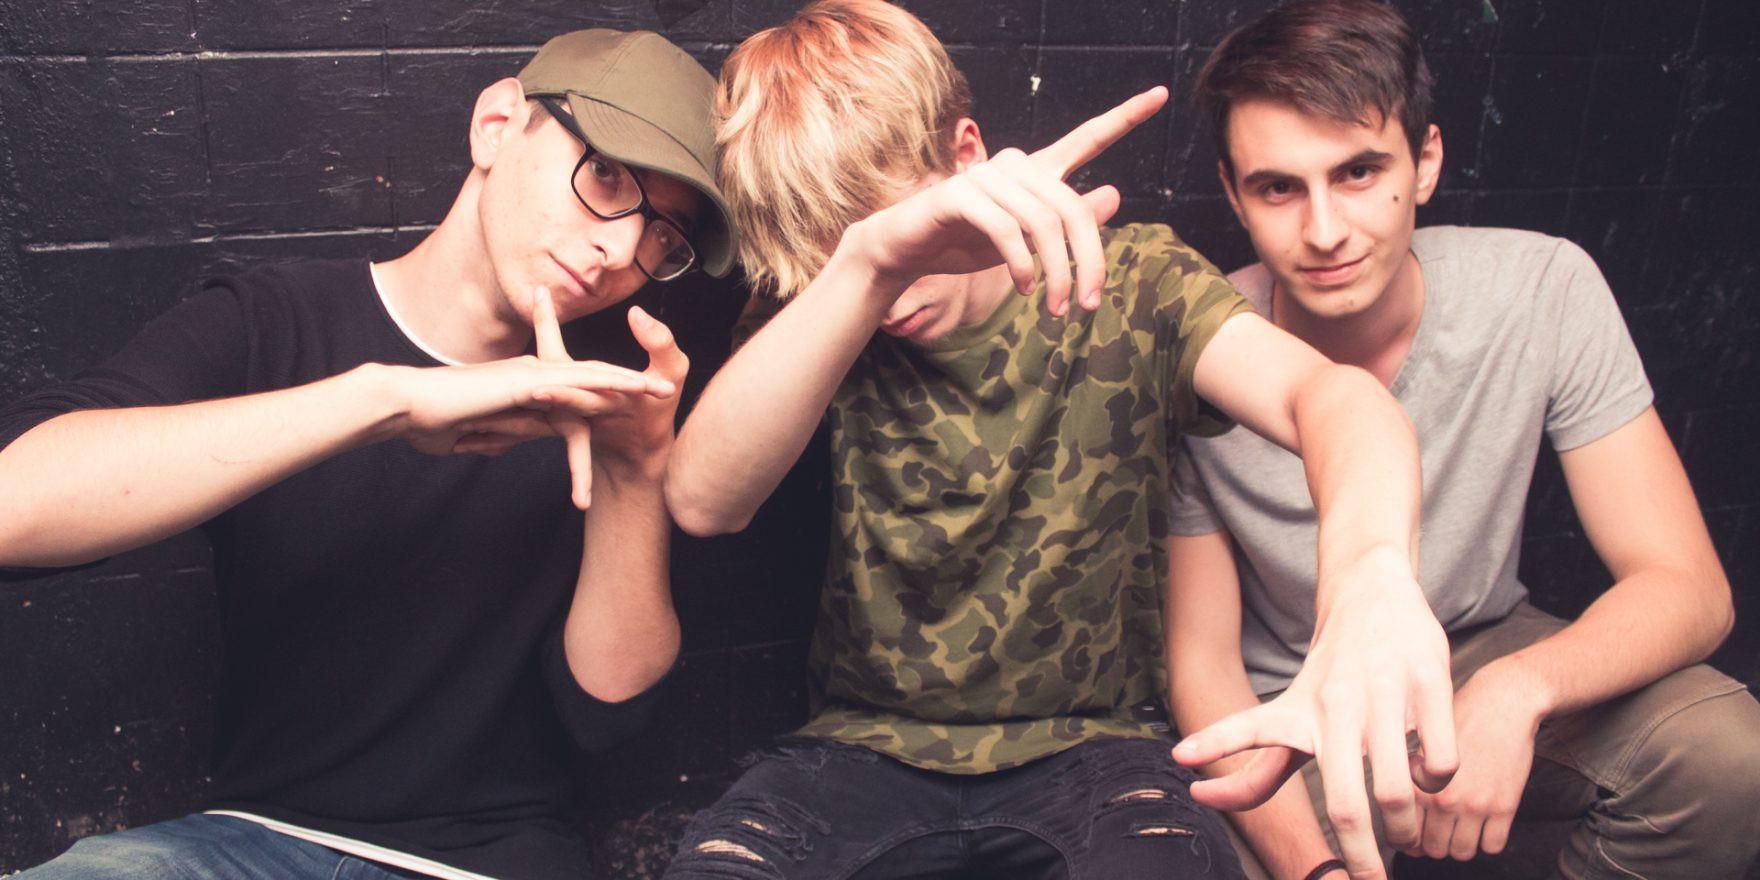 THE HIVE pres. Tantrum Desire, Limited & Swifta MC @ Flex Wien